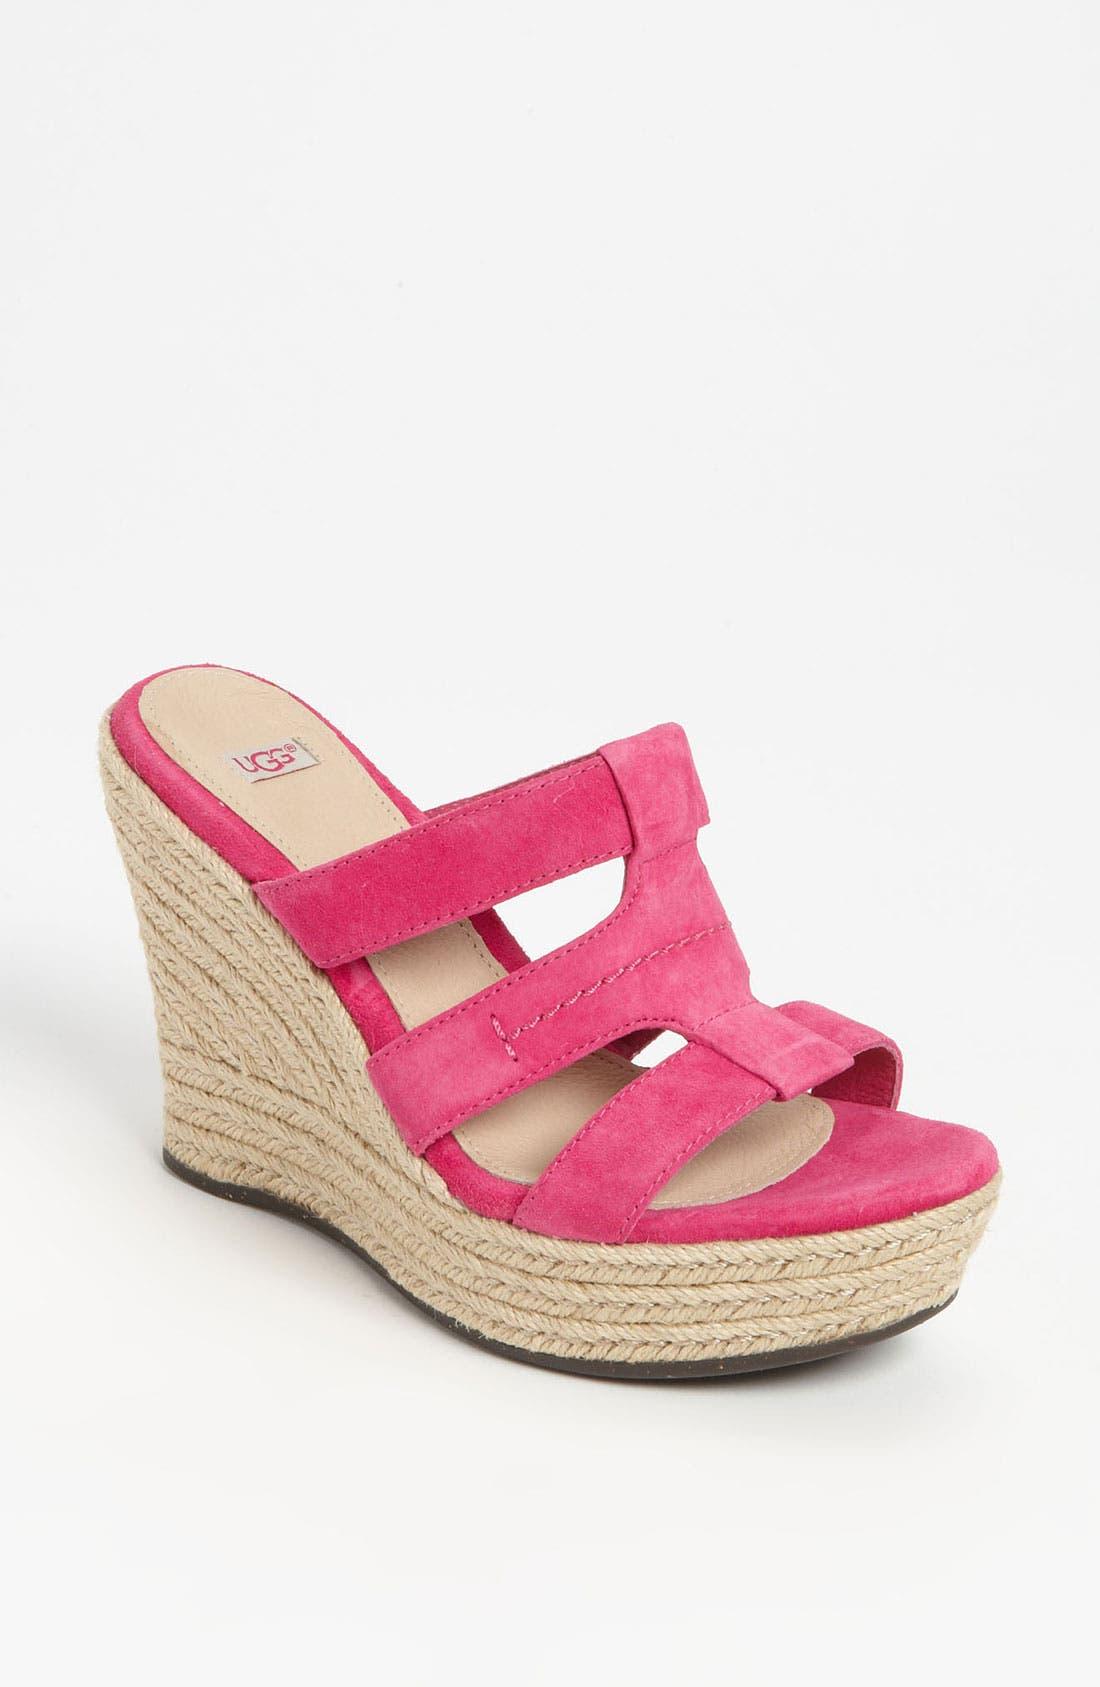 Main Image - UGG® Australia 'Tawnie' Sandal